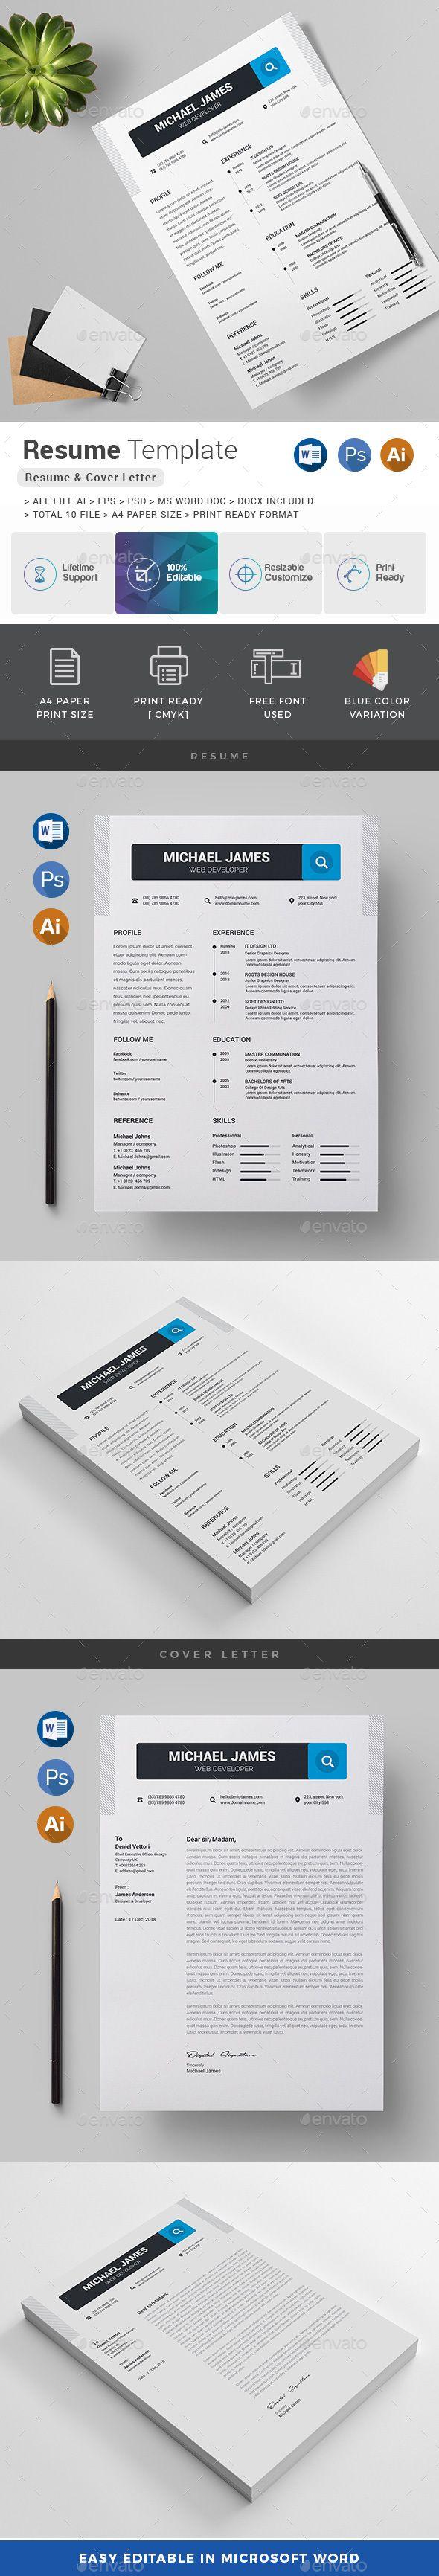 3566 best Resume Templates images on Pinterest   Font logo, Resume ...